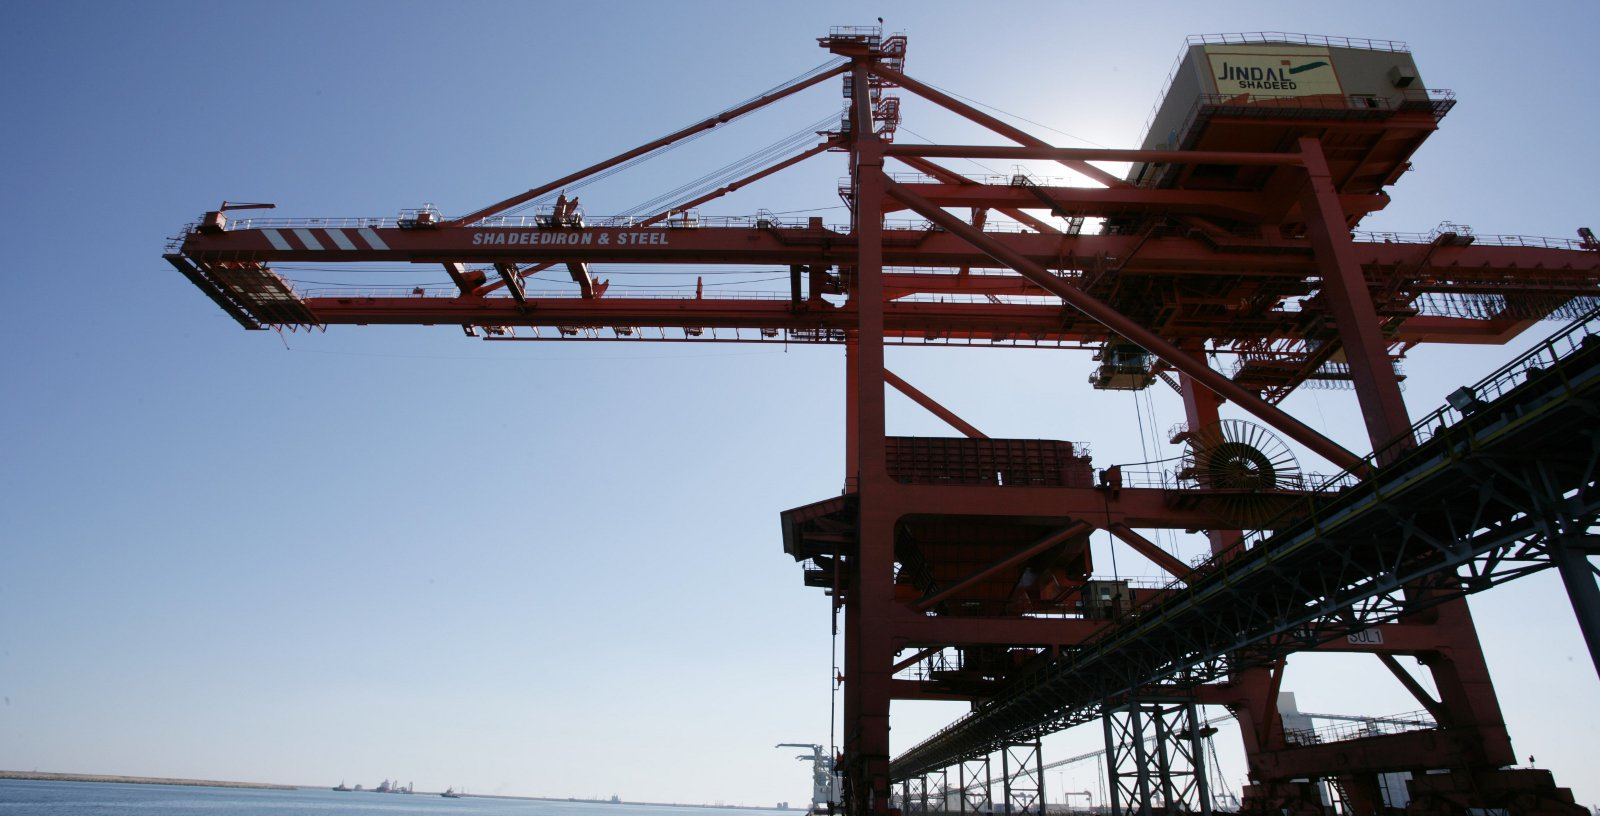 JINDAL_Iron_ore_Sohar_port_Oman_Idom06